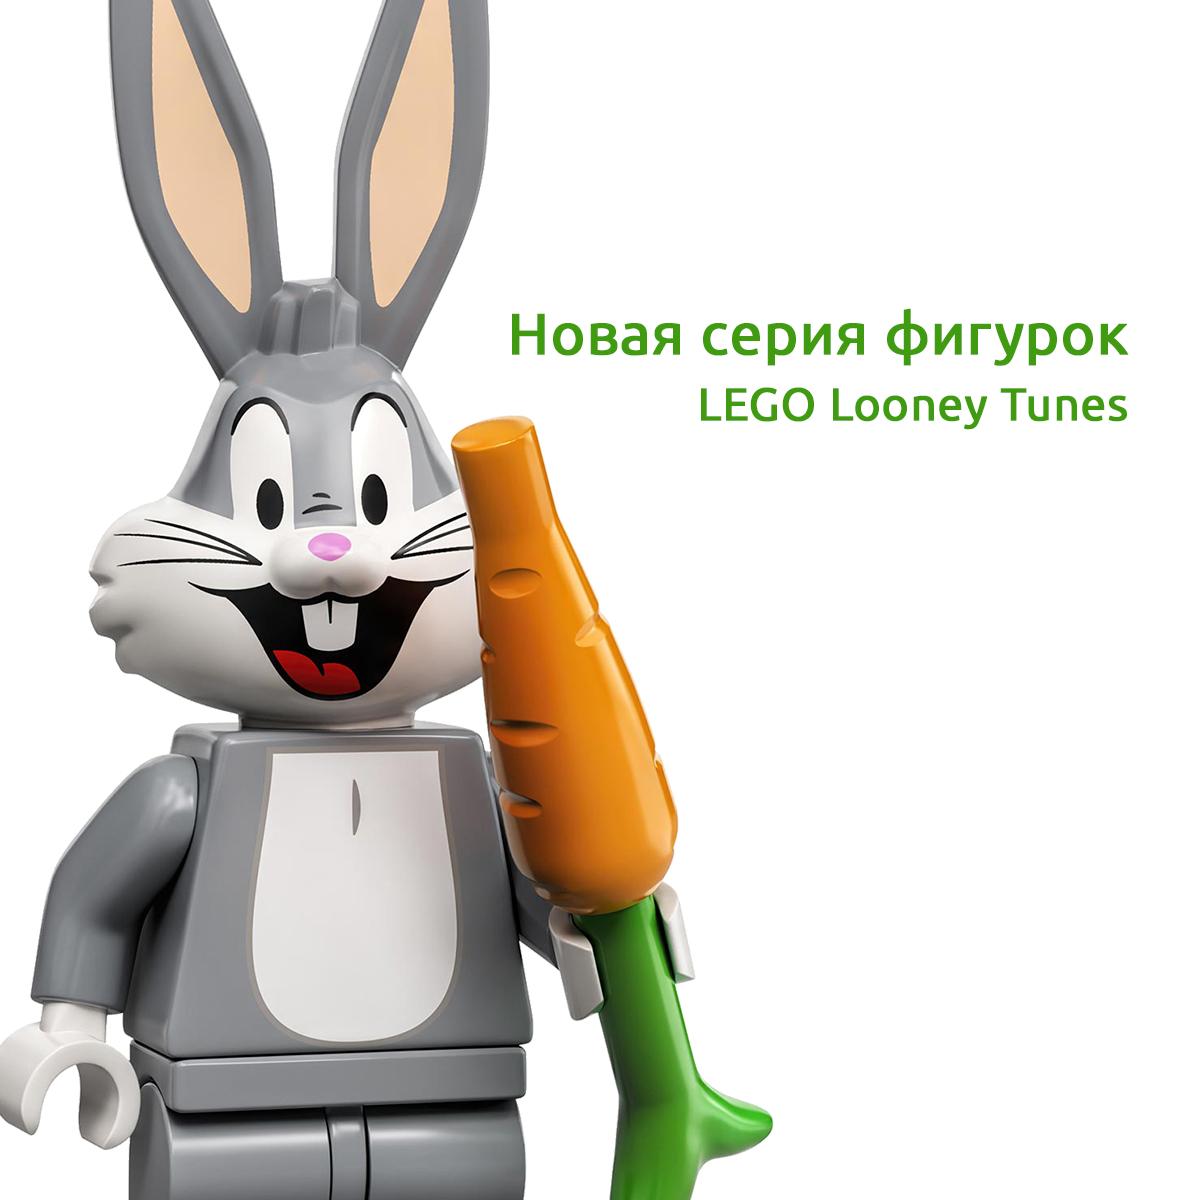 LEGO https://le-go.ru/lego-minifigures/minifigures-lego-looney-tunes/